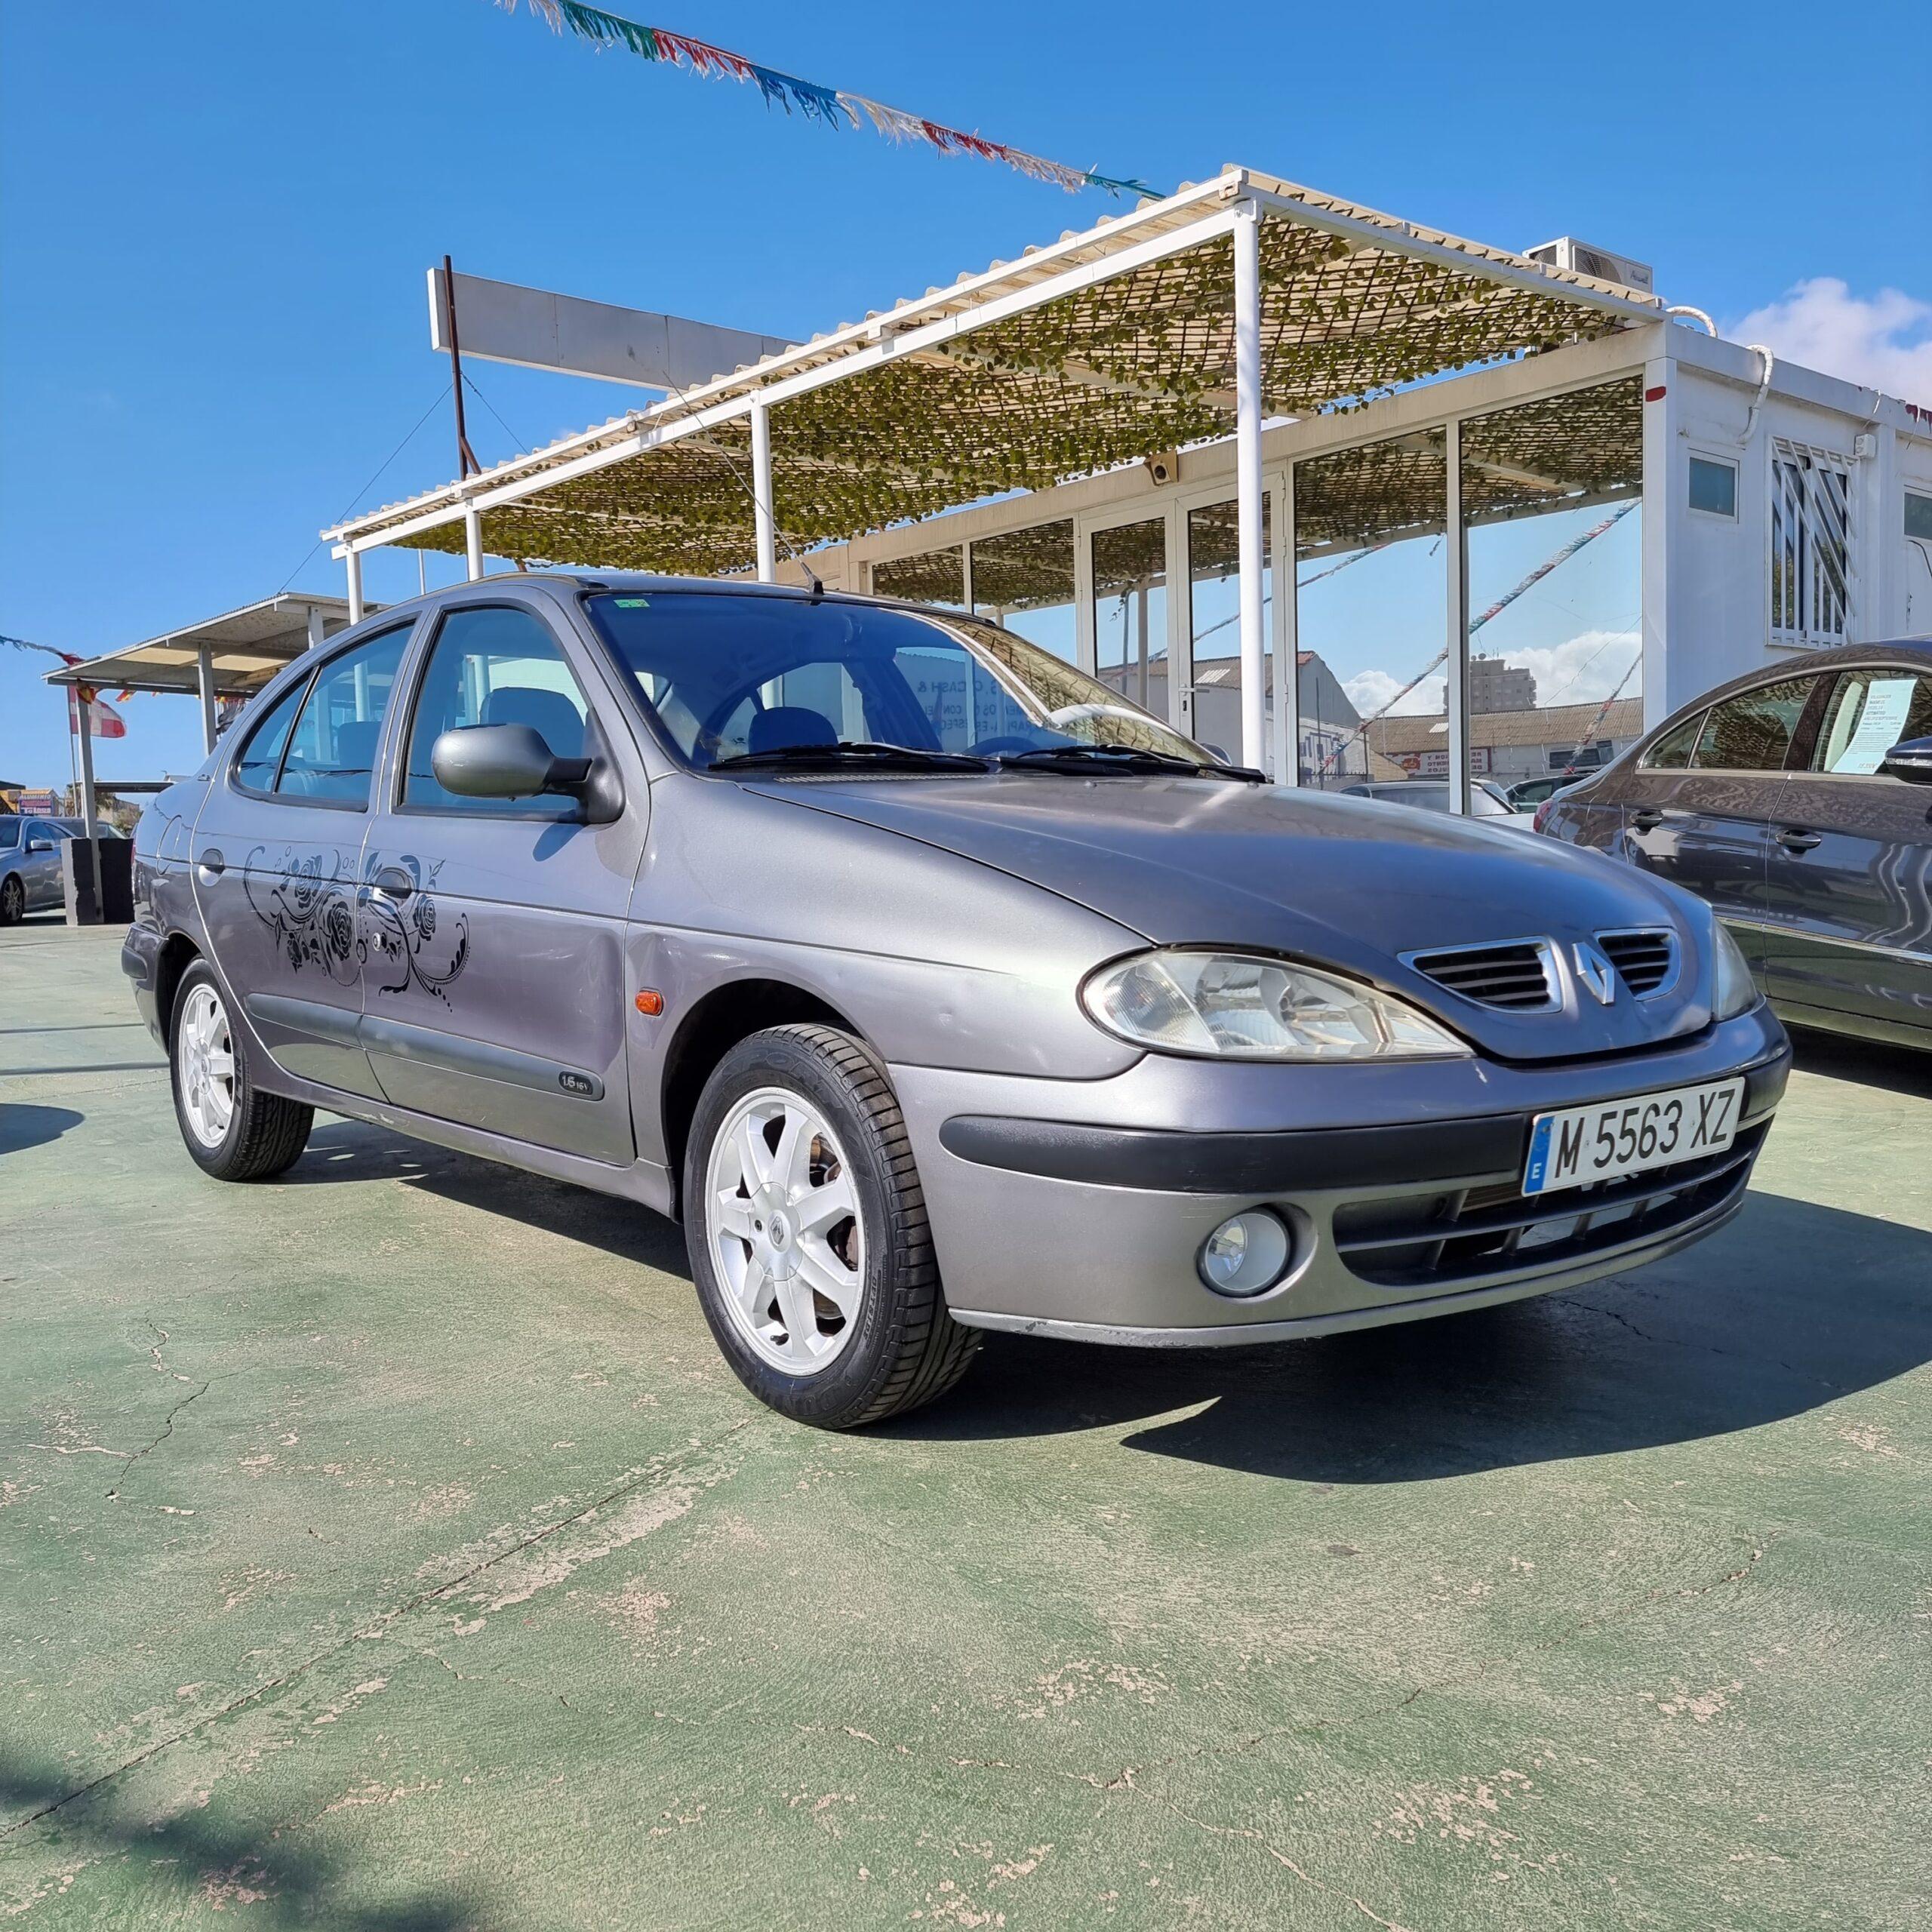 Renault_Megane_Classic_1